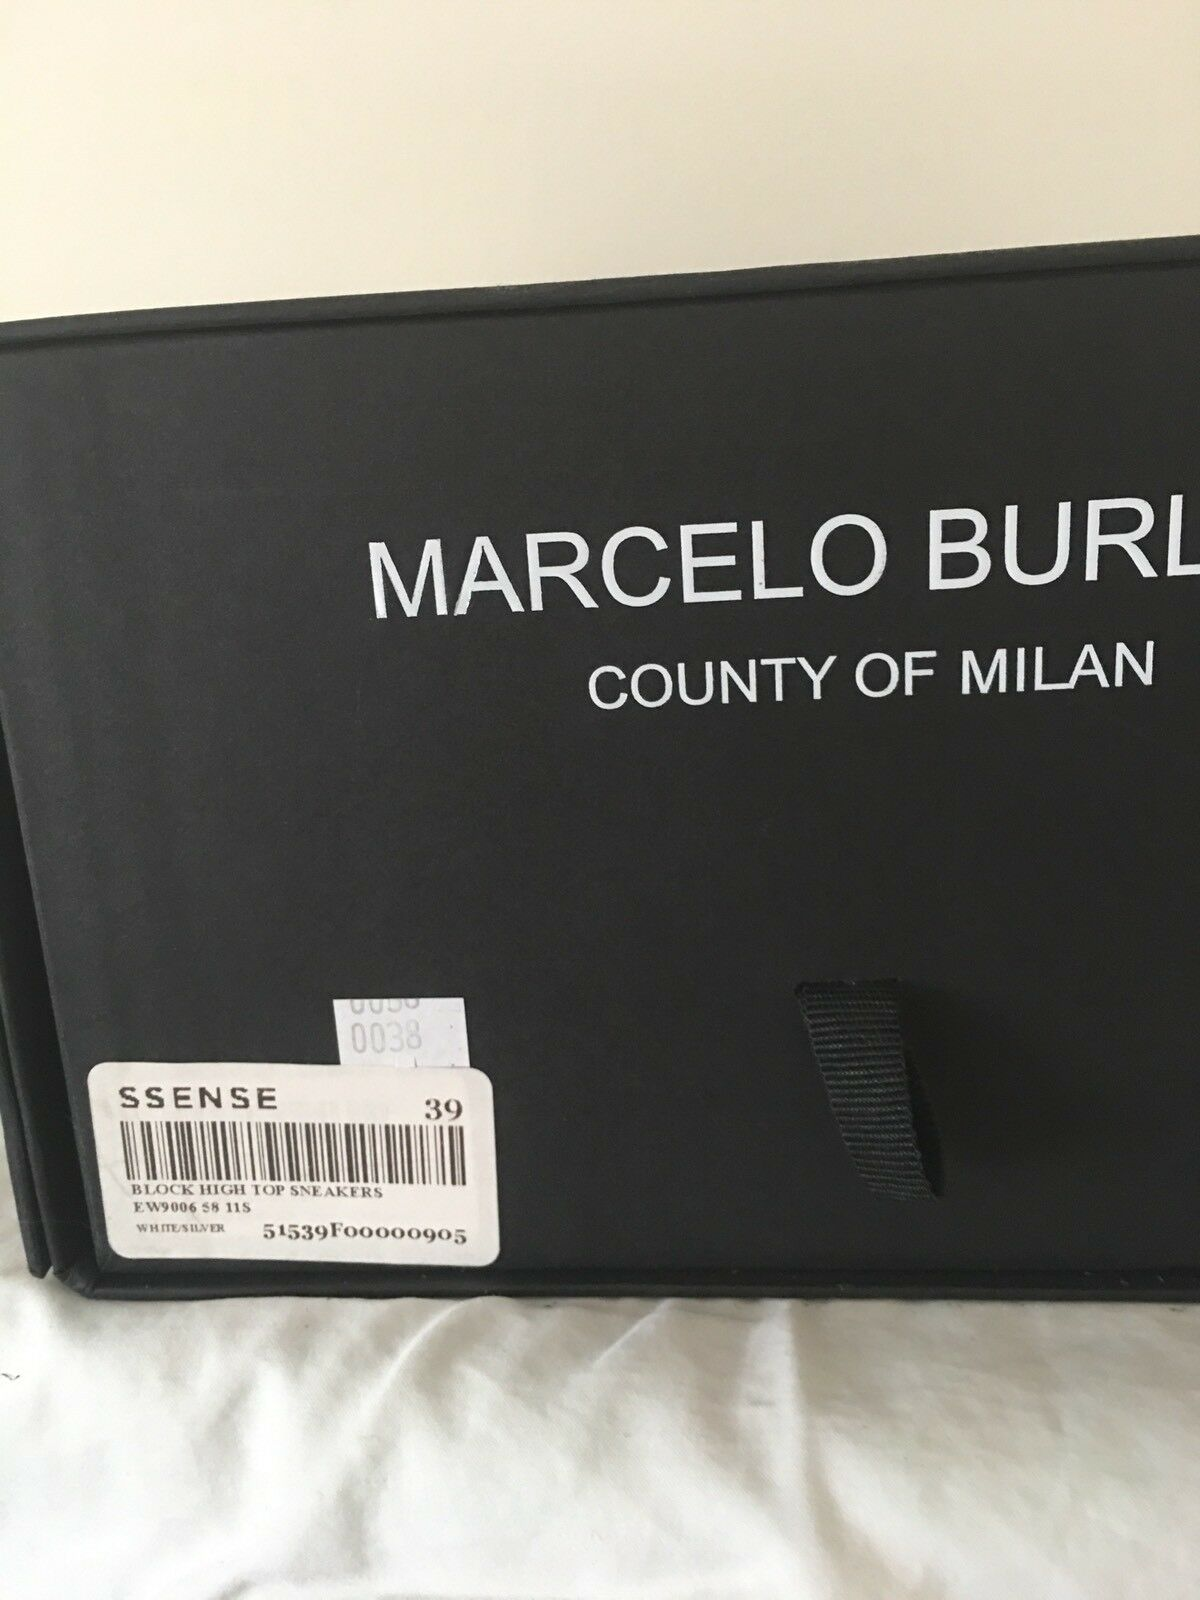 "NIB MARCELO MARCELO MARCELO BRULON ""BLOCK"" SILVER HIGHTOP Sneakers sz 39. RARE FIND. 64b1e5"